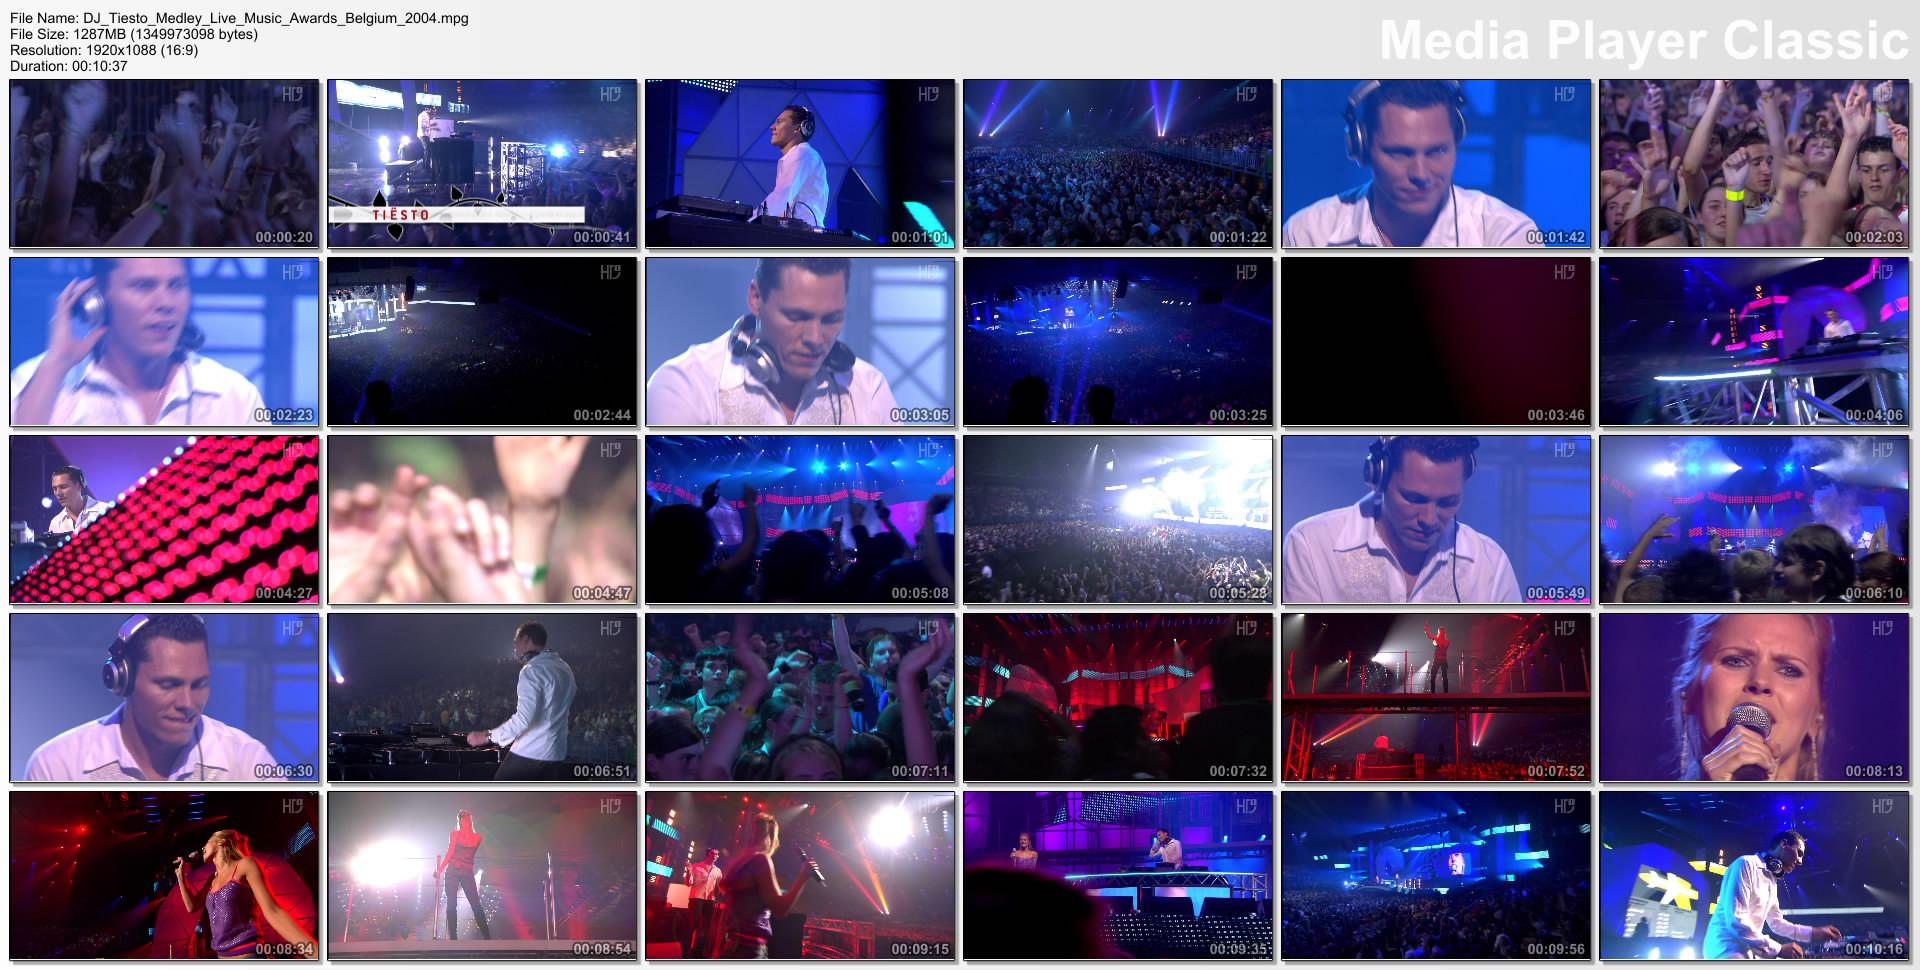 DJ Tiesto - Medley [Live Tmf Music Awards Belgium] ...